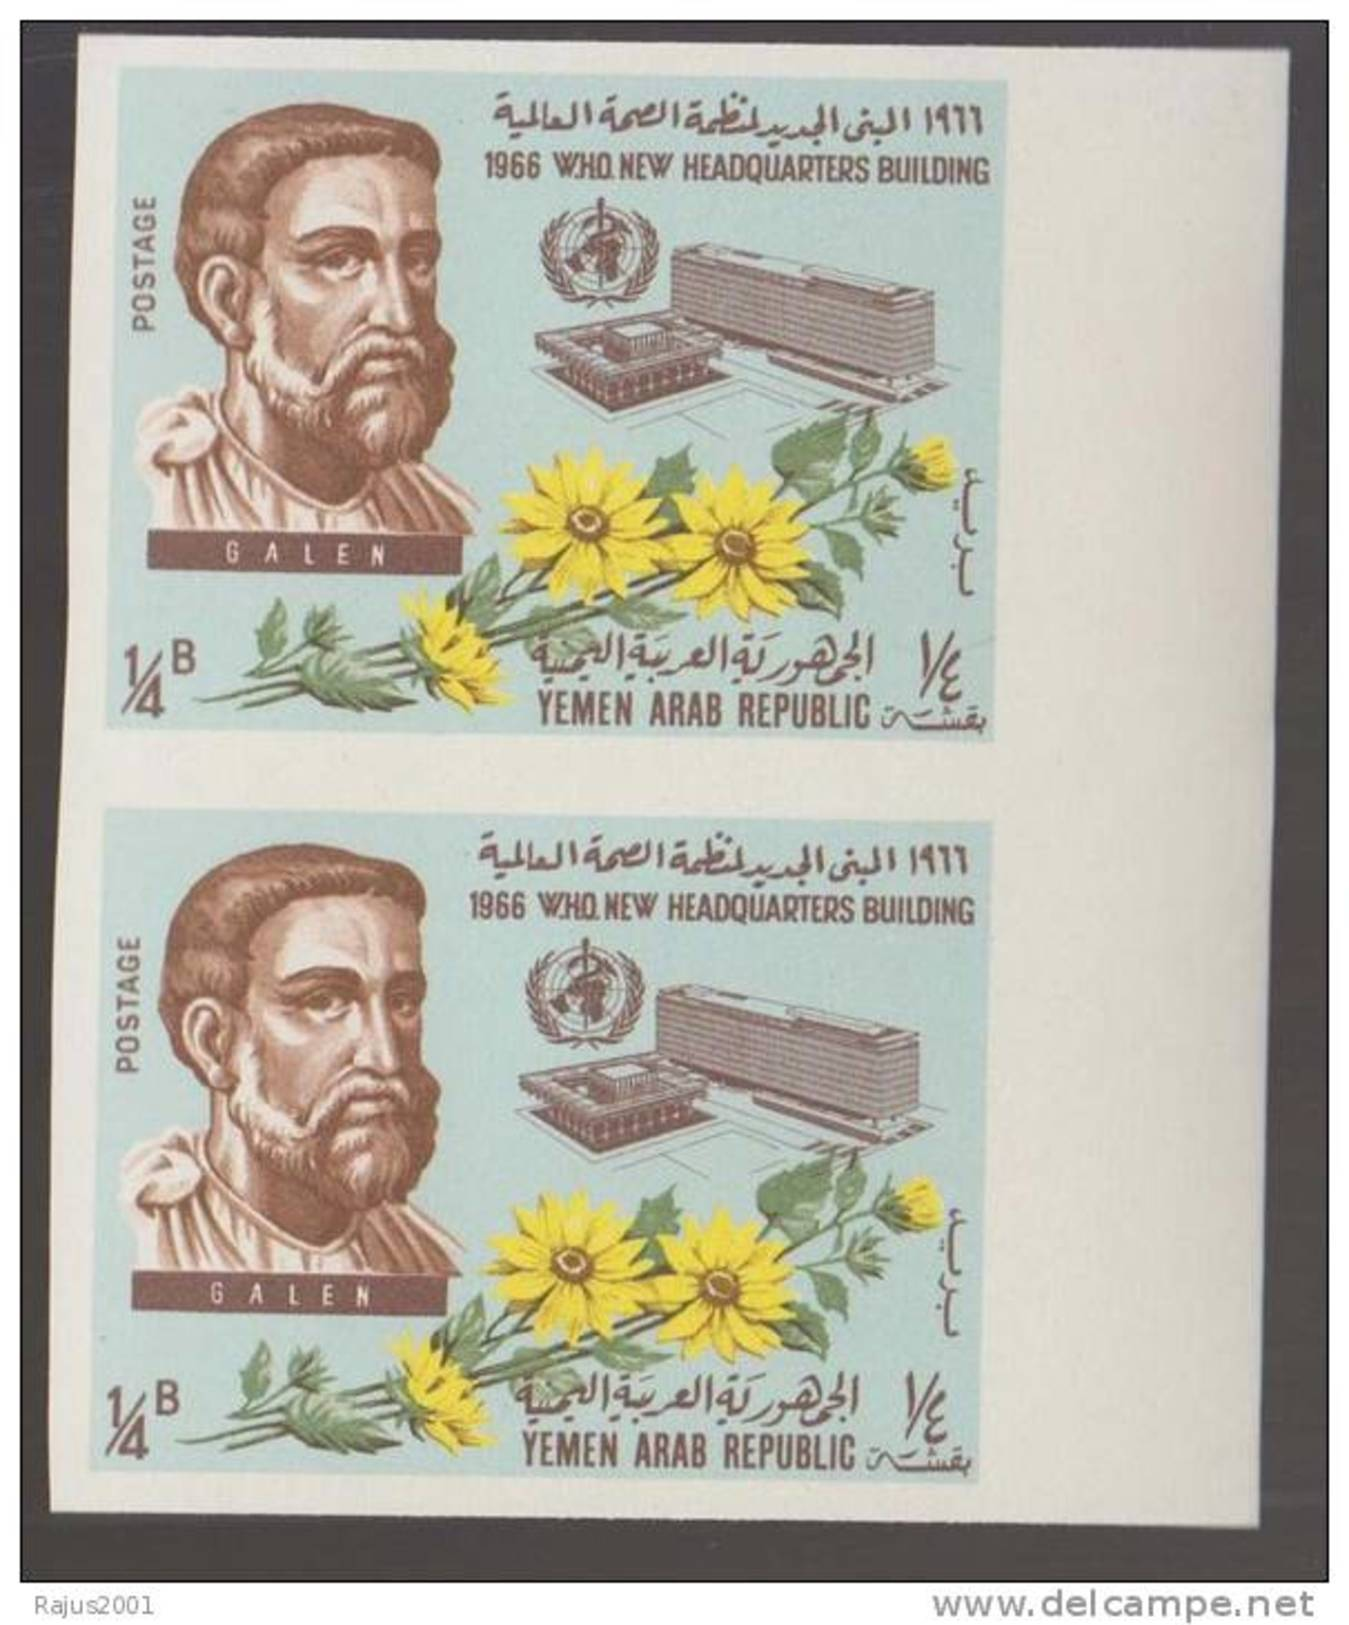 IMPERF PAIR Galen, Physician, Anatomy, Physiology, Physics, Medicinal Plant, Flower, Block MNH 1966 Yemen Arab Republic - Medicine